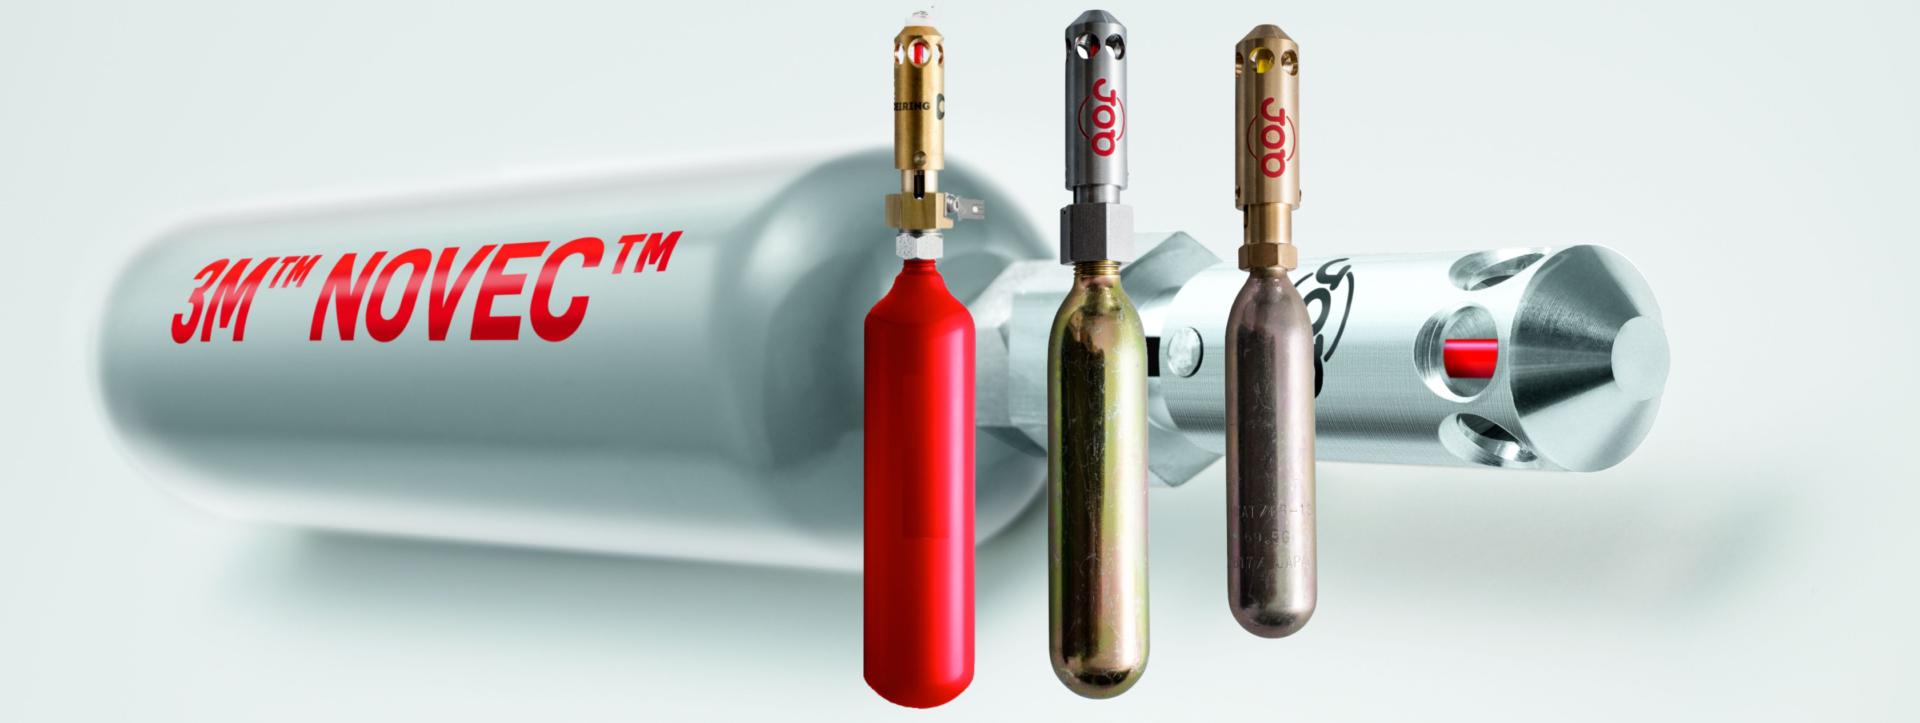 AMFE (Automatic Miniature Fire Extinguisher)